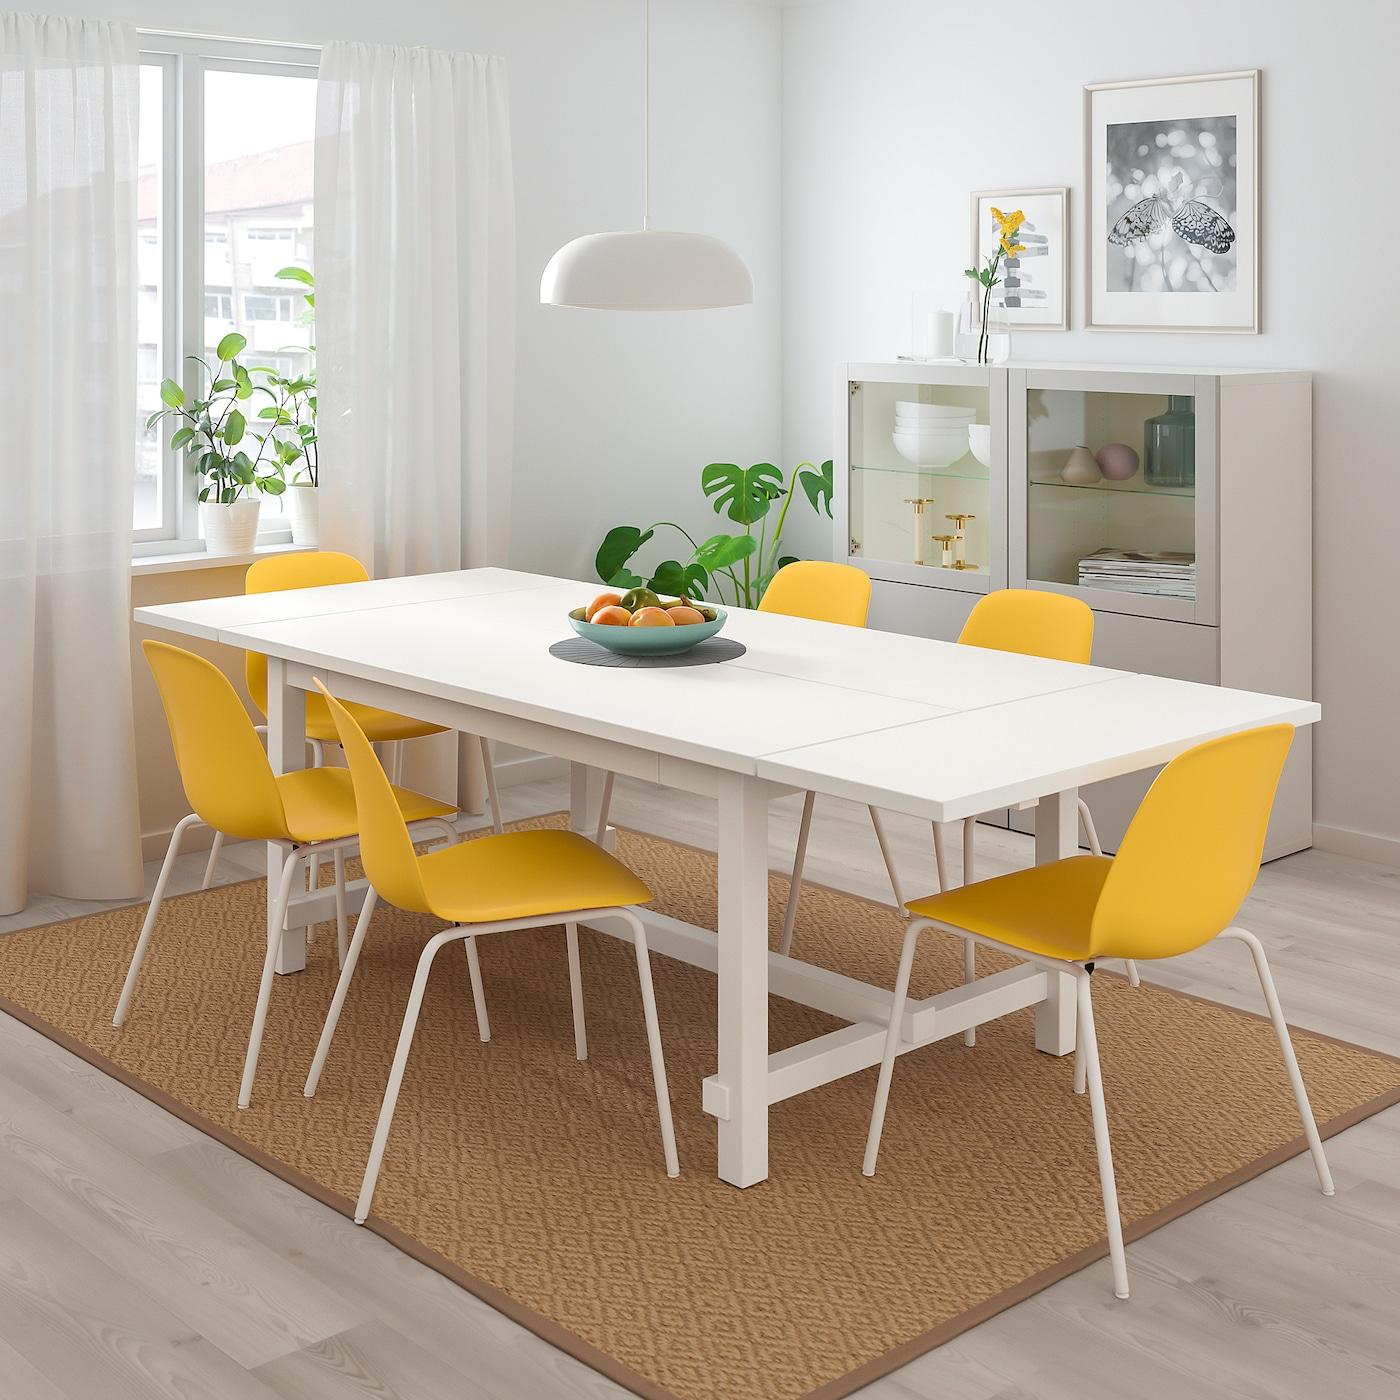 NORDVIKEN / LEIFARNE Table and 10 chairs - white/Broringe white 10/10x10 cm